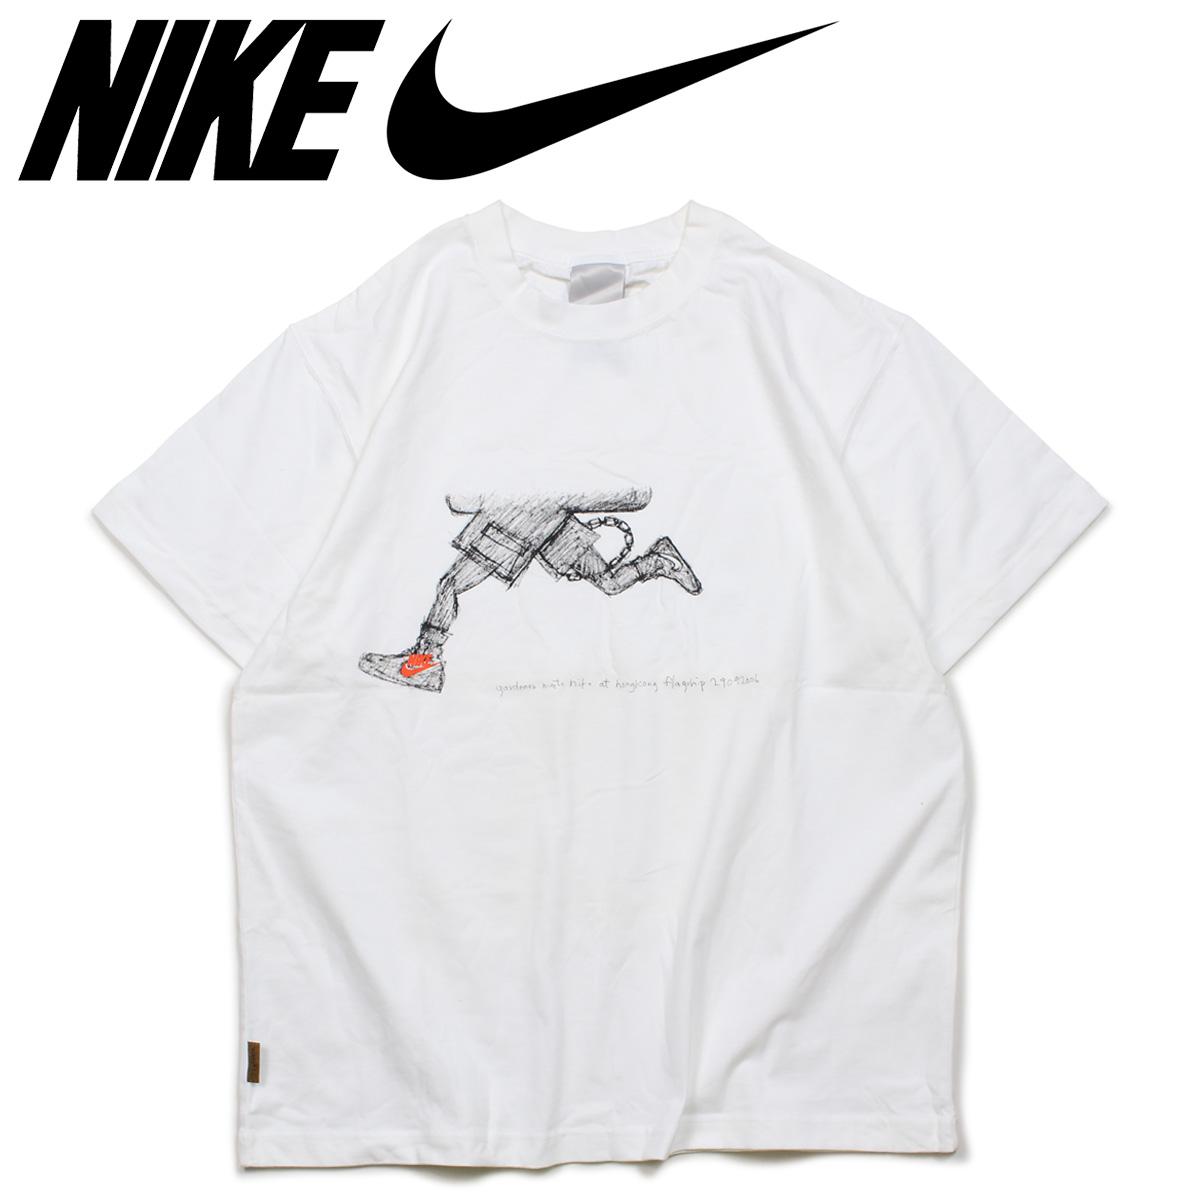 NIKE Nike SB T shirt men short sleeves GARDENER MEETS NIKE マイケルラウ MICHAEL LAU white white